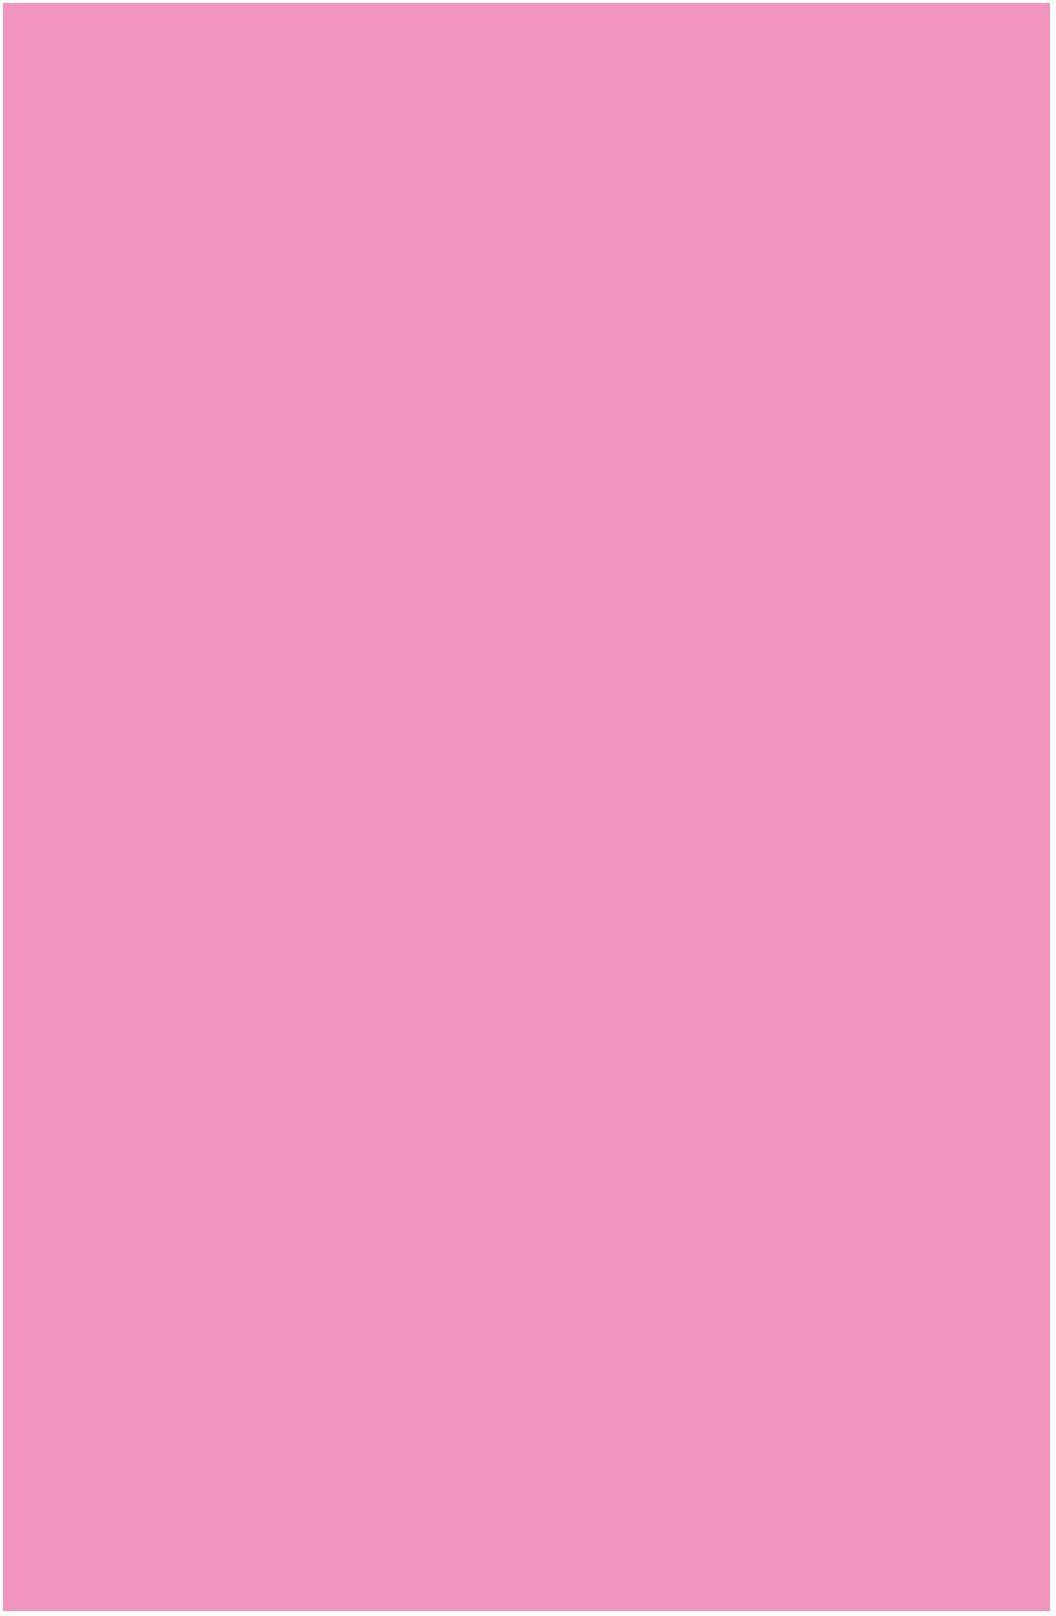 Karton kolor A1 jasnoróżowy Lux Interdruk 106